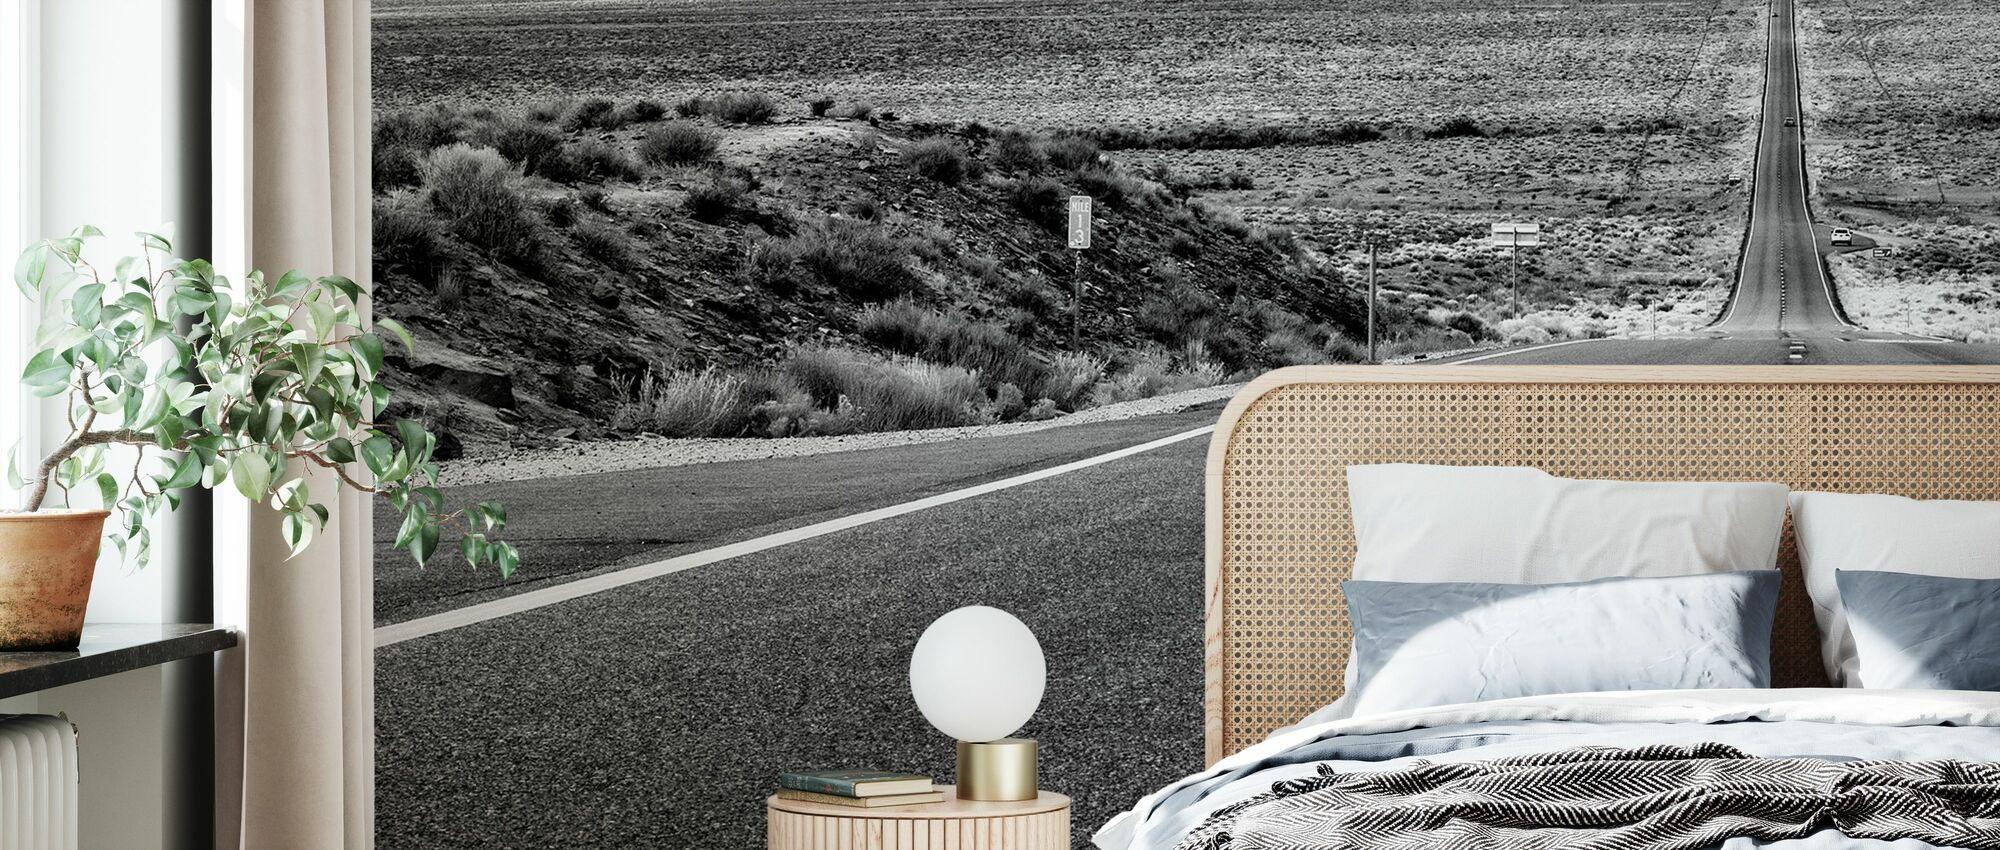 Black Arizona - Monument Valley Road - Wallpaper - Bedroom